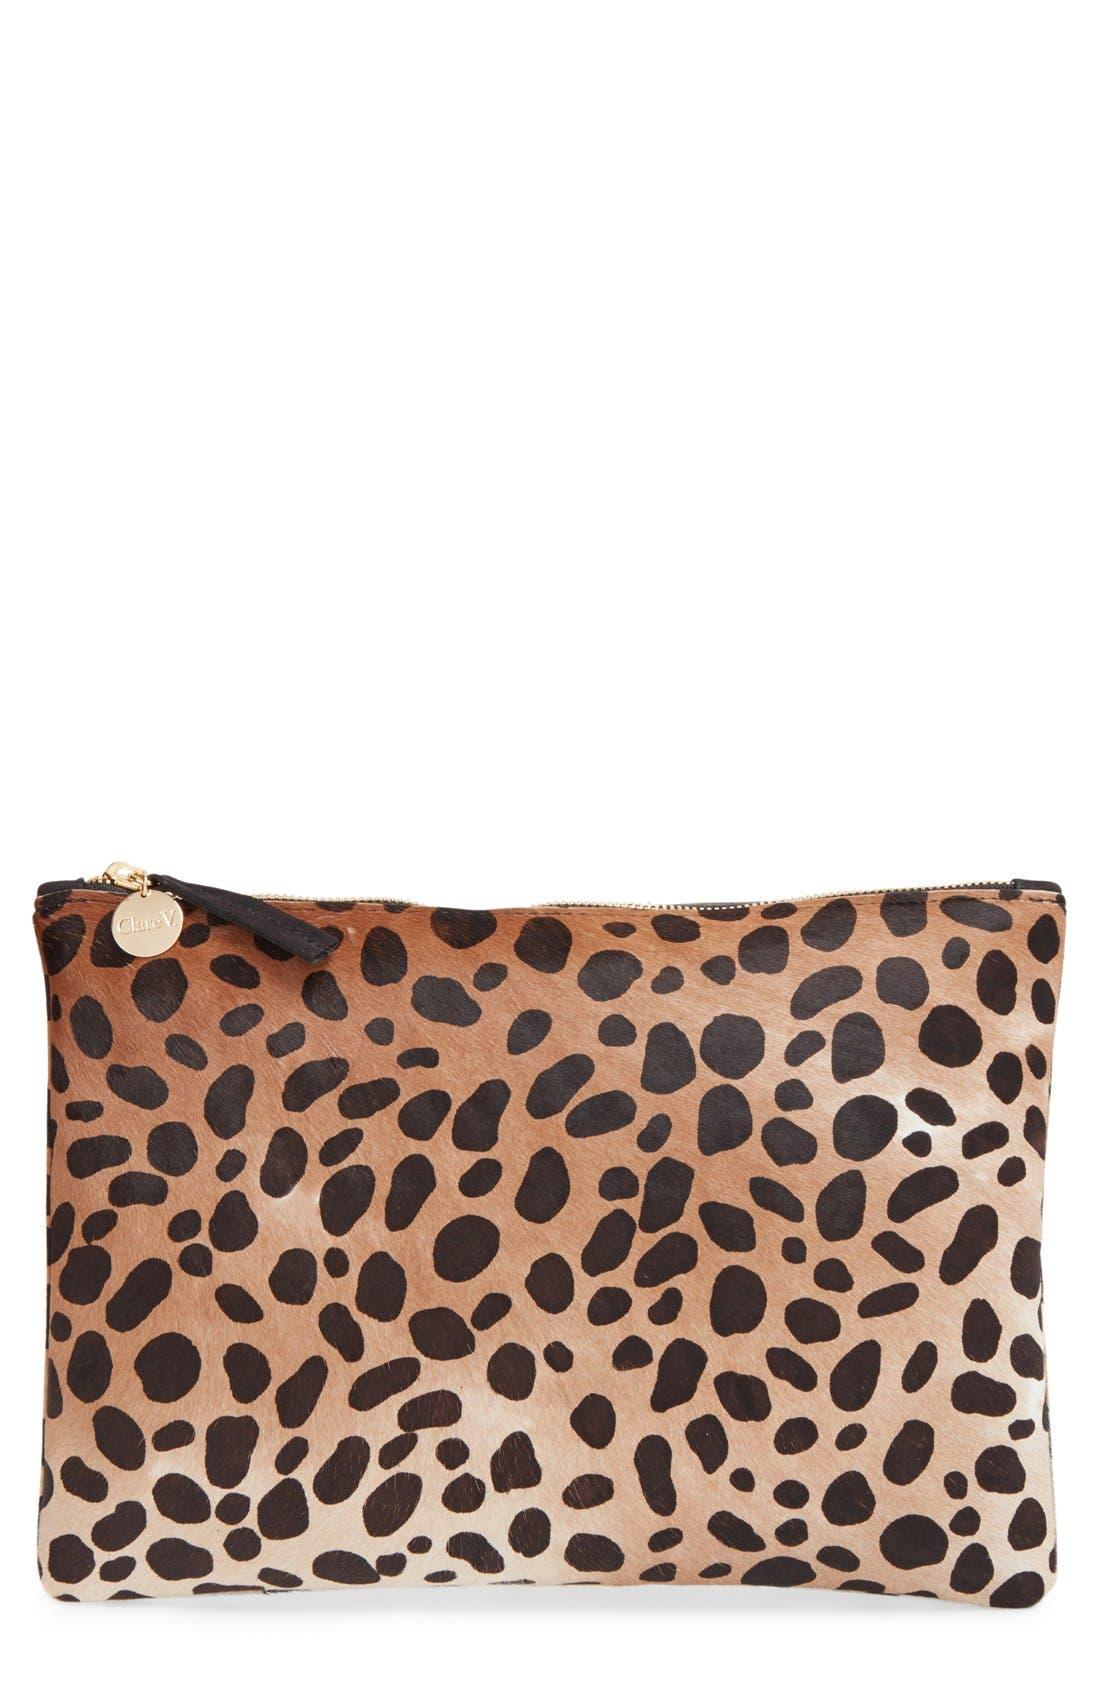 Genuine Calf Hair Leopard Print Zip Clutch, Main, color, 250